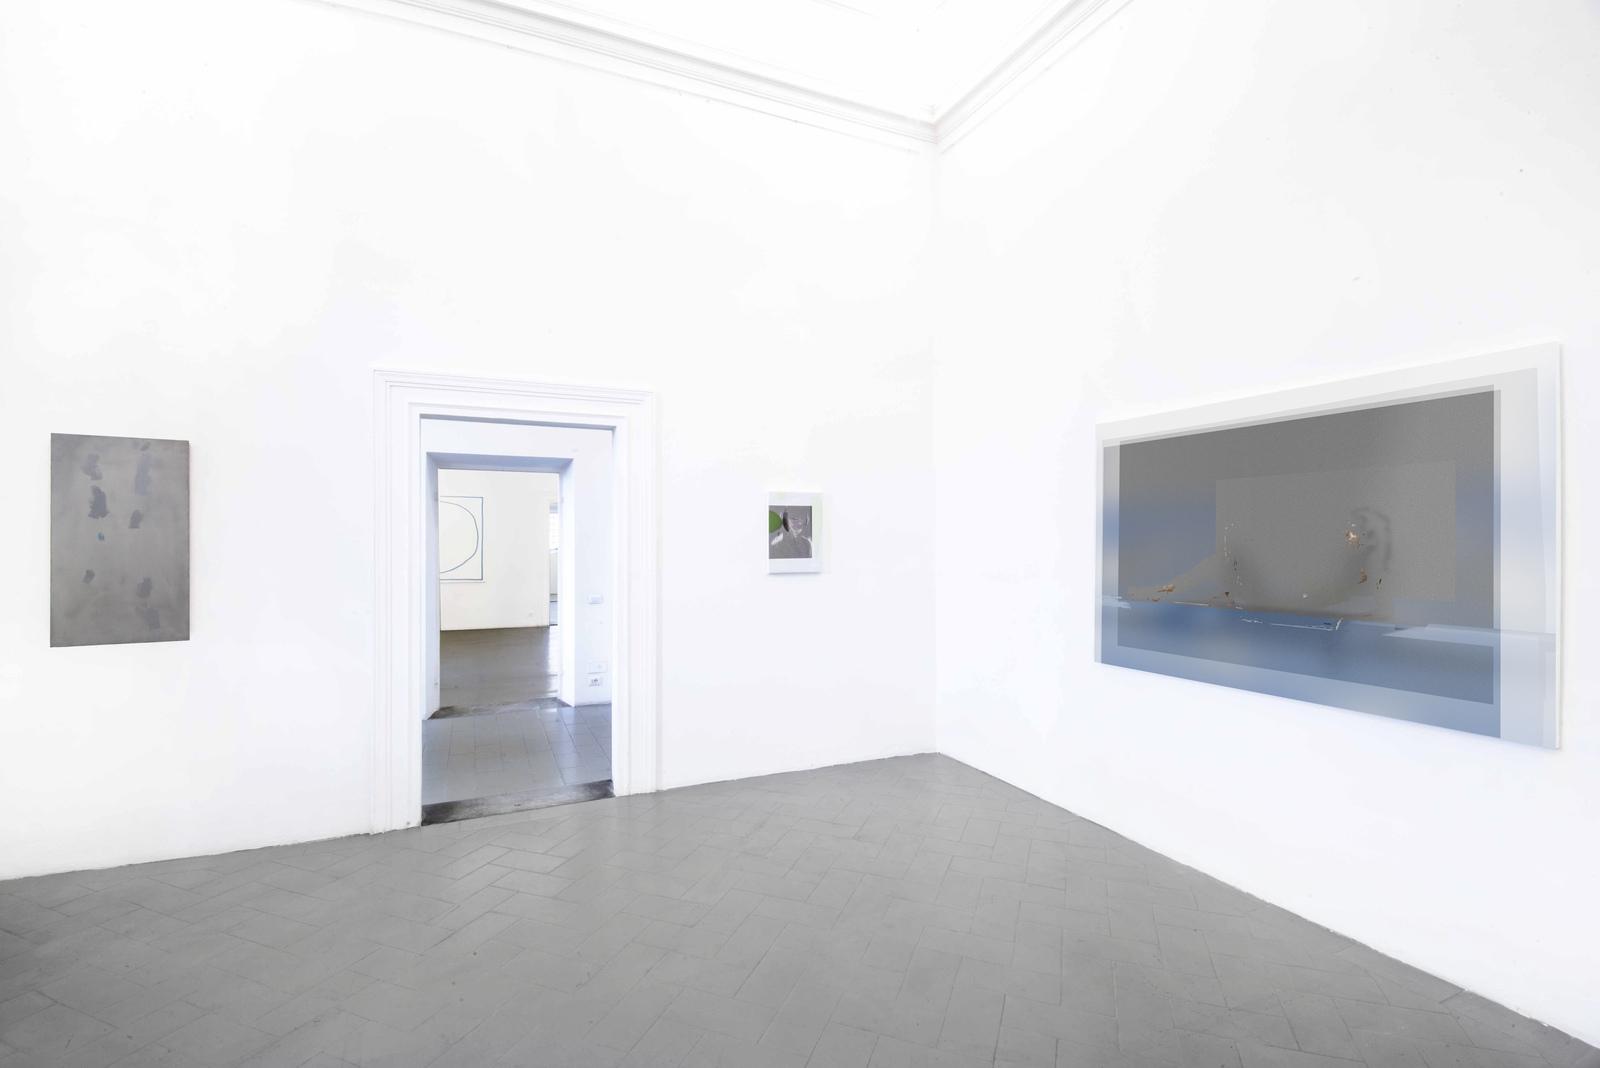 12.Installation View. Matthew Musgrave, Stephen Felton, Joshua Citarella. Courtesy of Eduardo Secci Contemporary